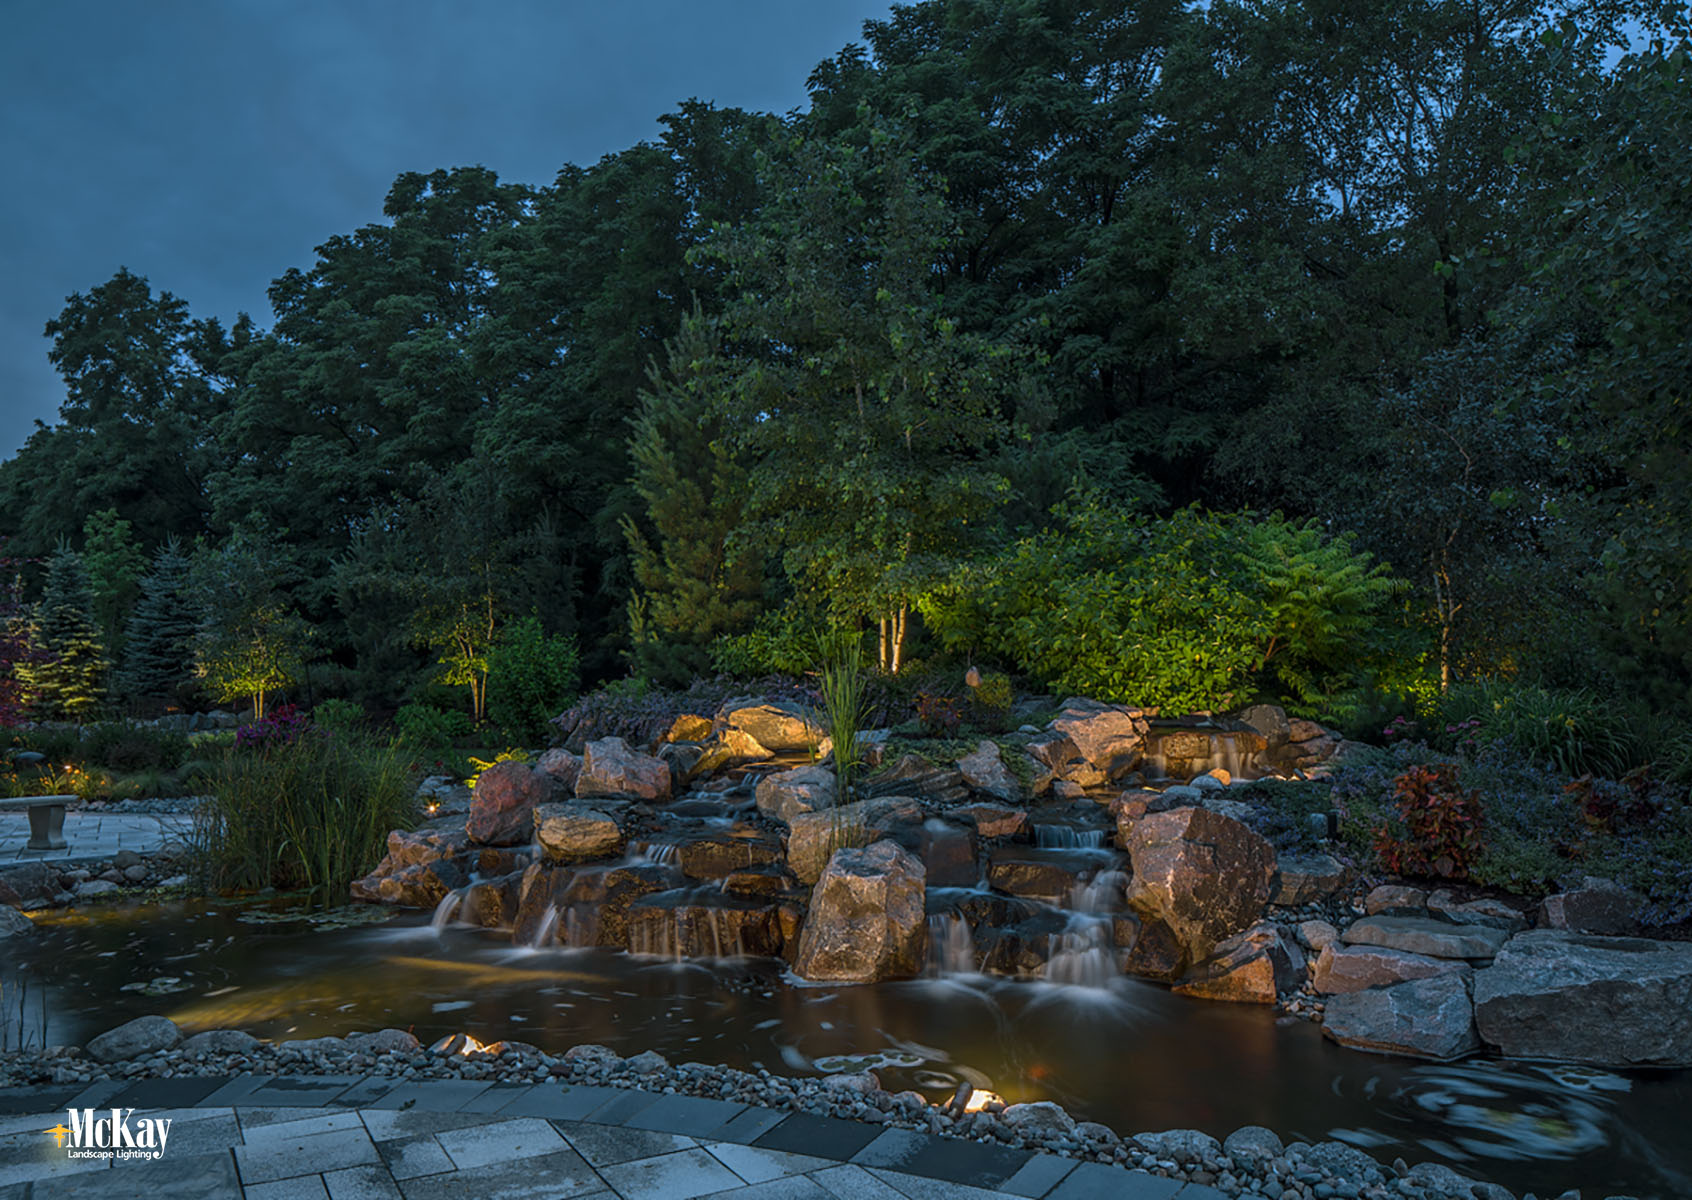 Landscape Lighting Design - Outdoor Pond Waterfall Elkhorn Nebraska | McKay Landscape Lighting